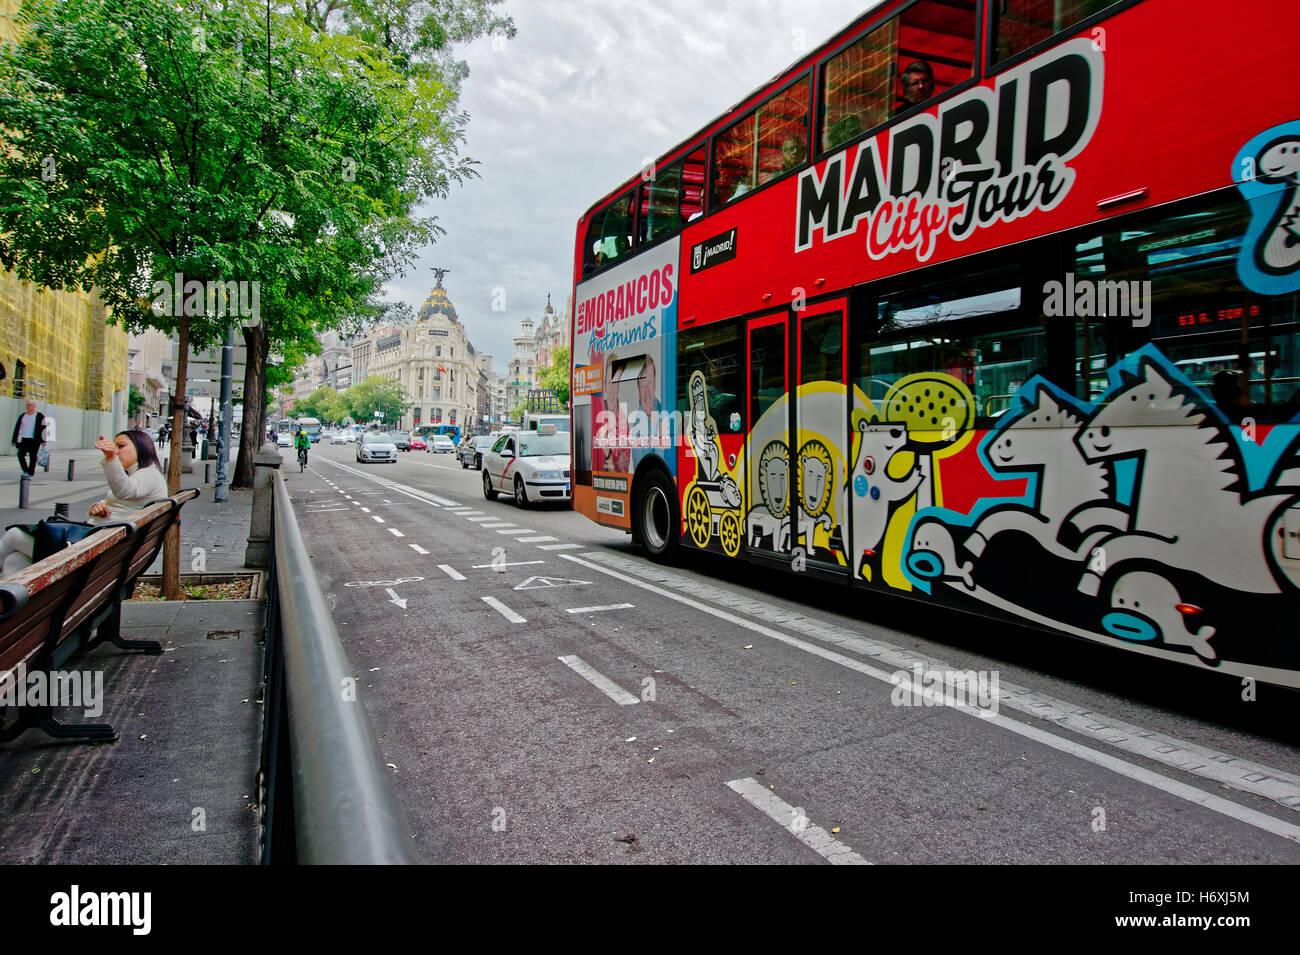 MADRID, SPAIN - OCTOBER 25, 2016: Madrid City Tour bus on the street of Alcala, Madrid, Spain - Stock Image